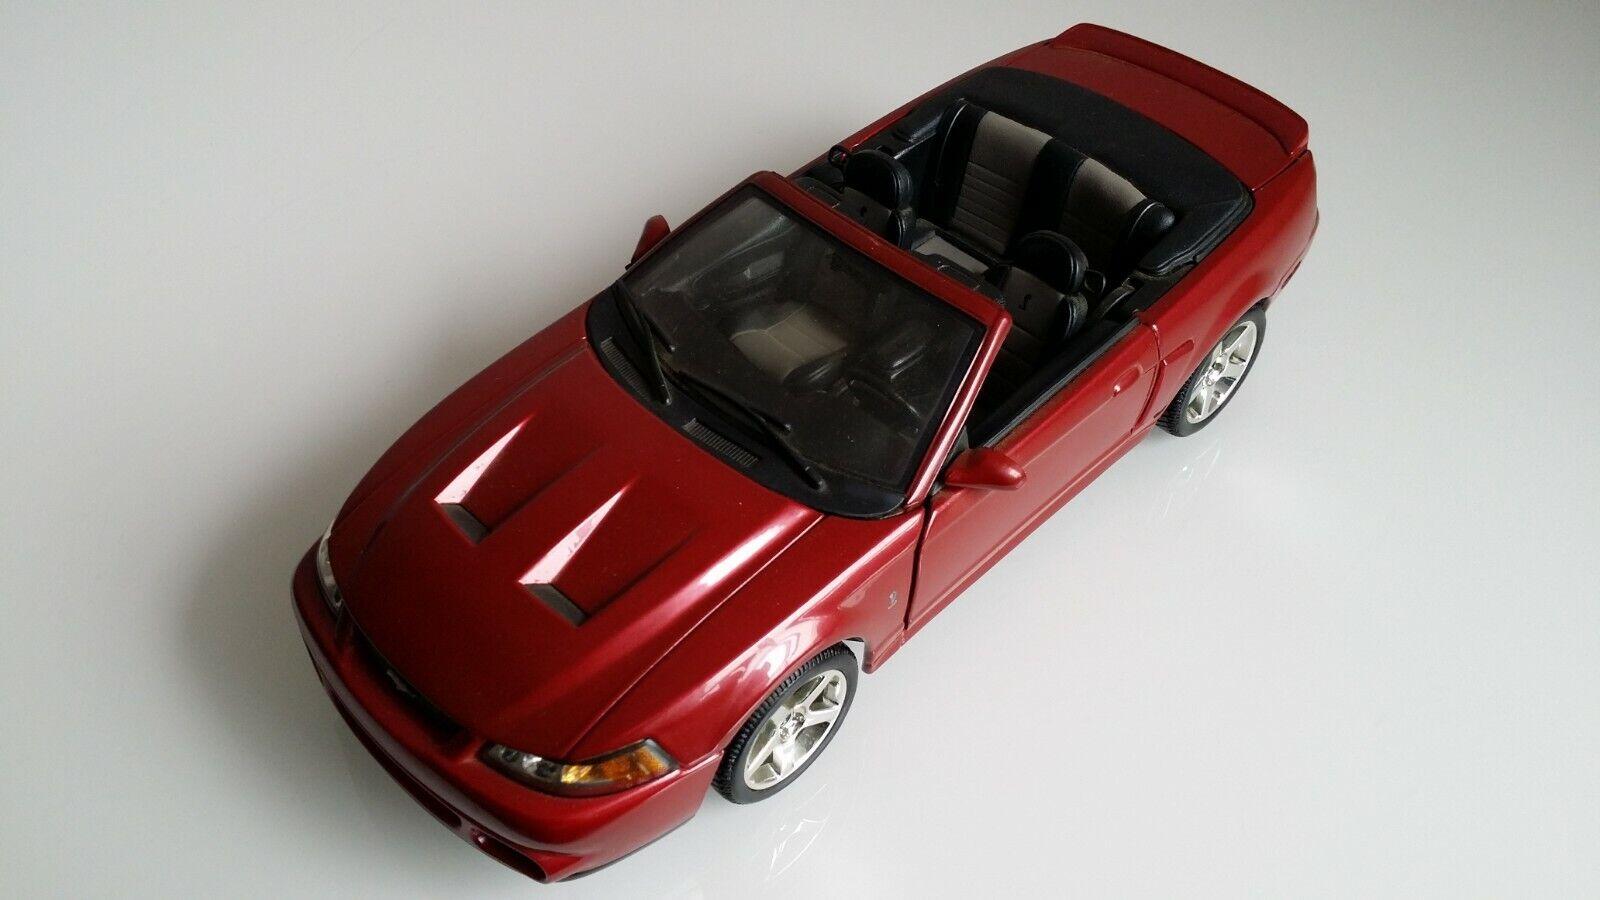 Maisto 2003 Ford Mustang Svt Cobra Converdeible 1 18 Rara